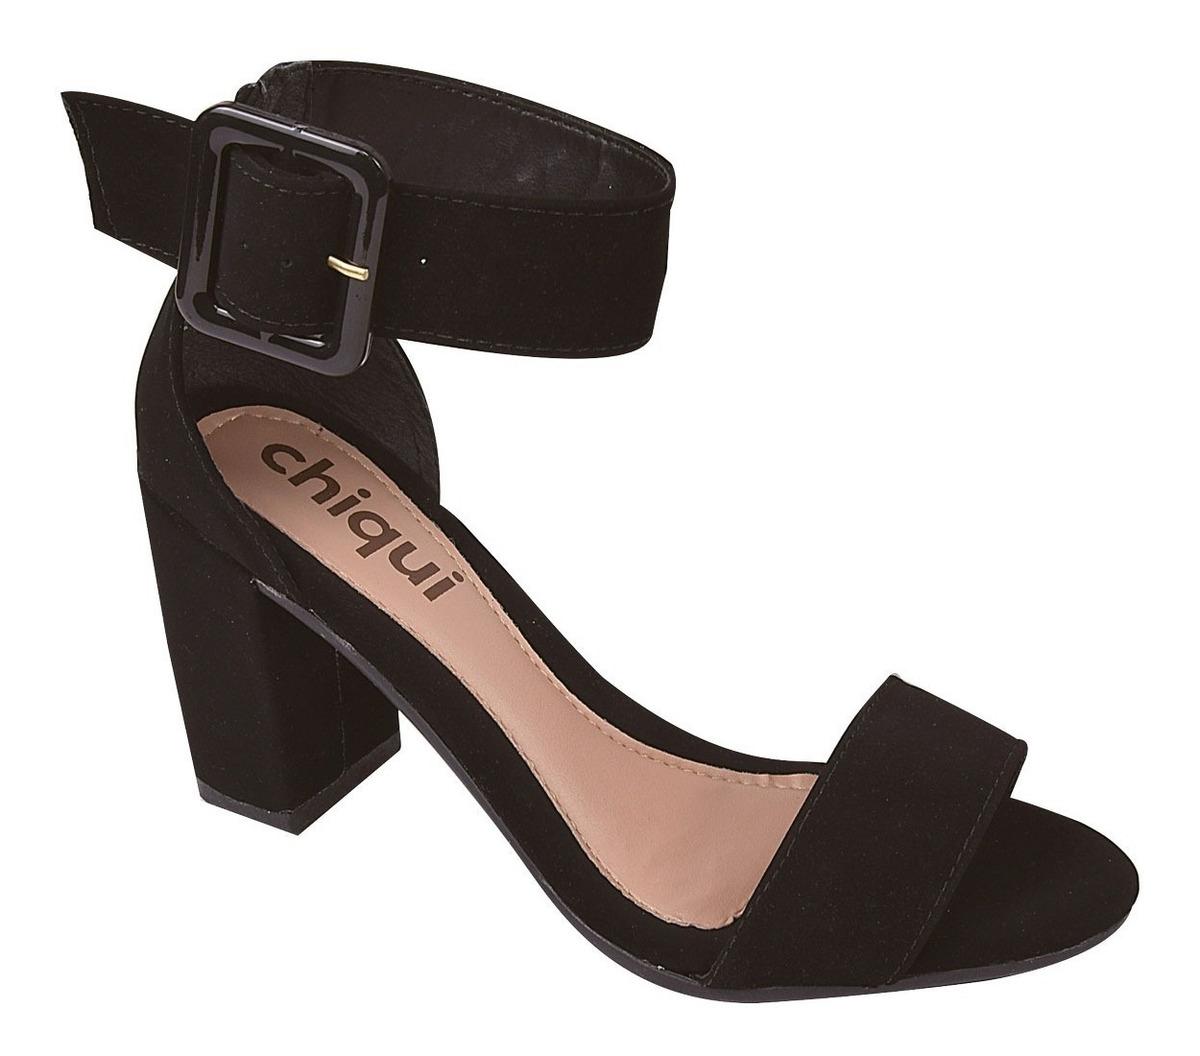 ecbbbc5b7 sandalia feminina salto alto grosso moda 2019 festa yrt2. Carregando zoom.